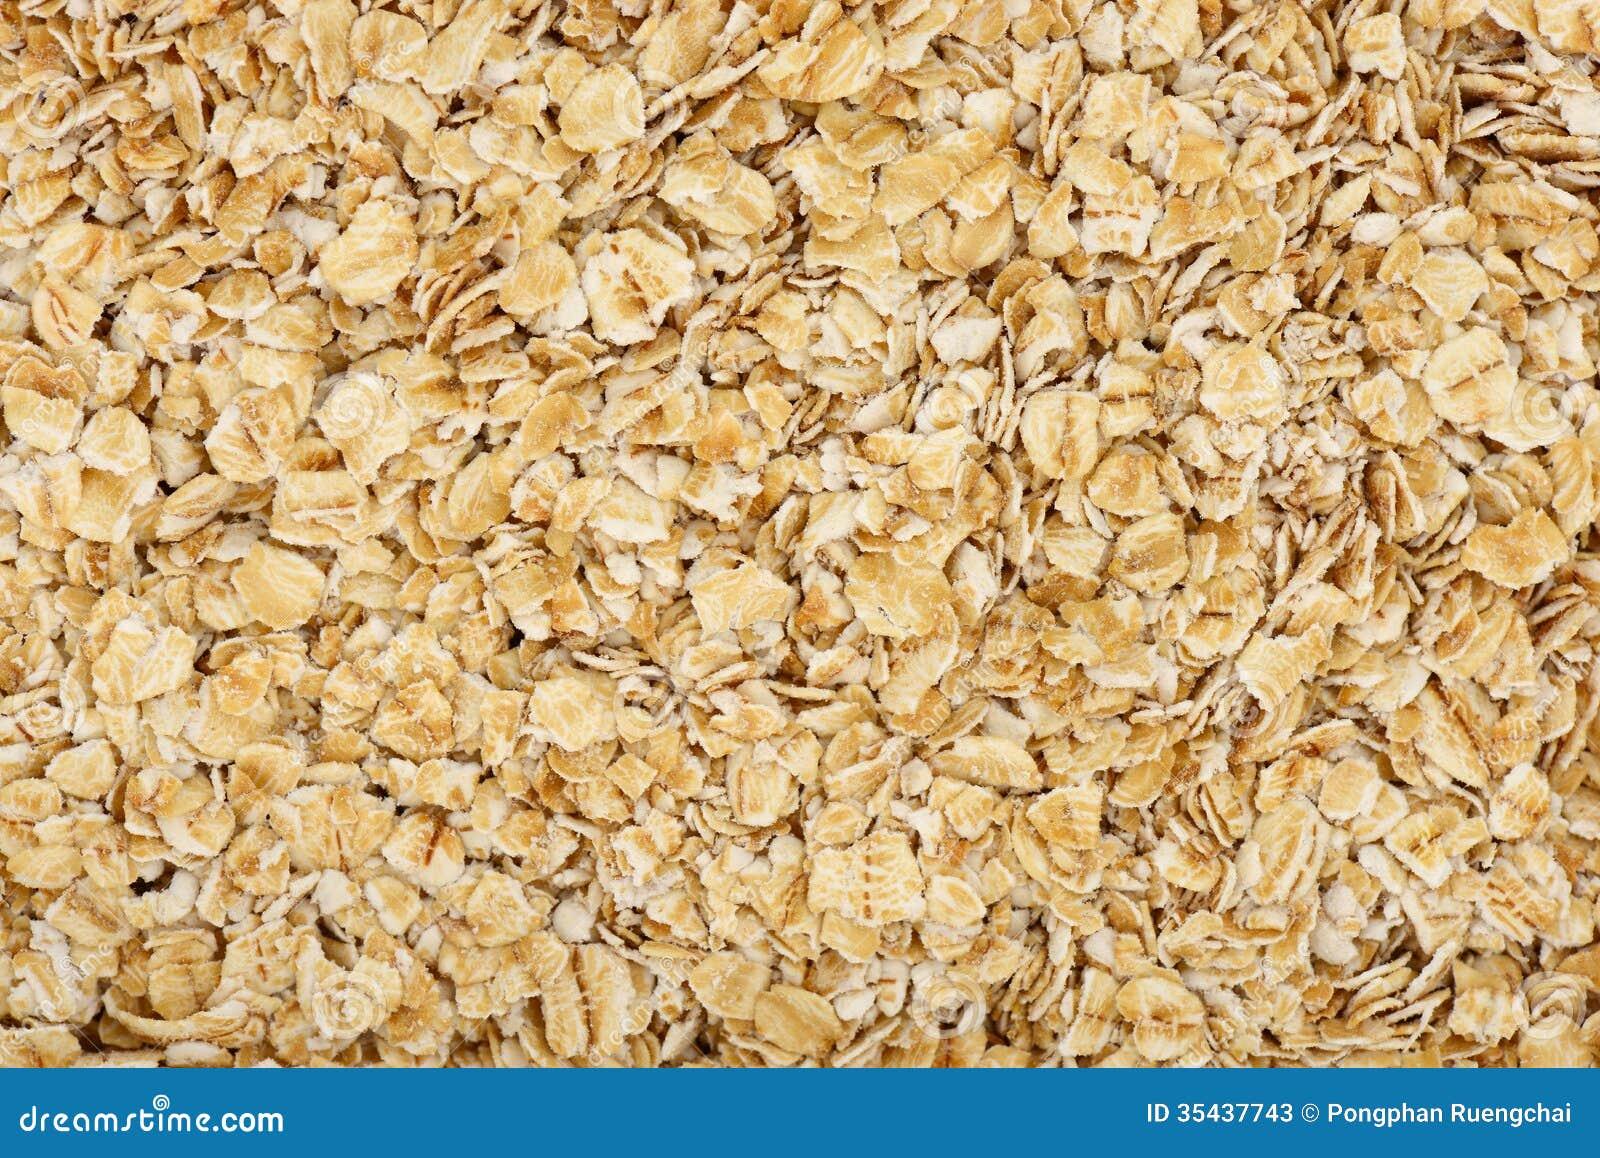 Is Oatmeal A Whole Grain Food